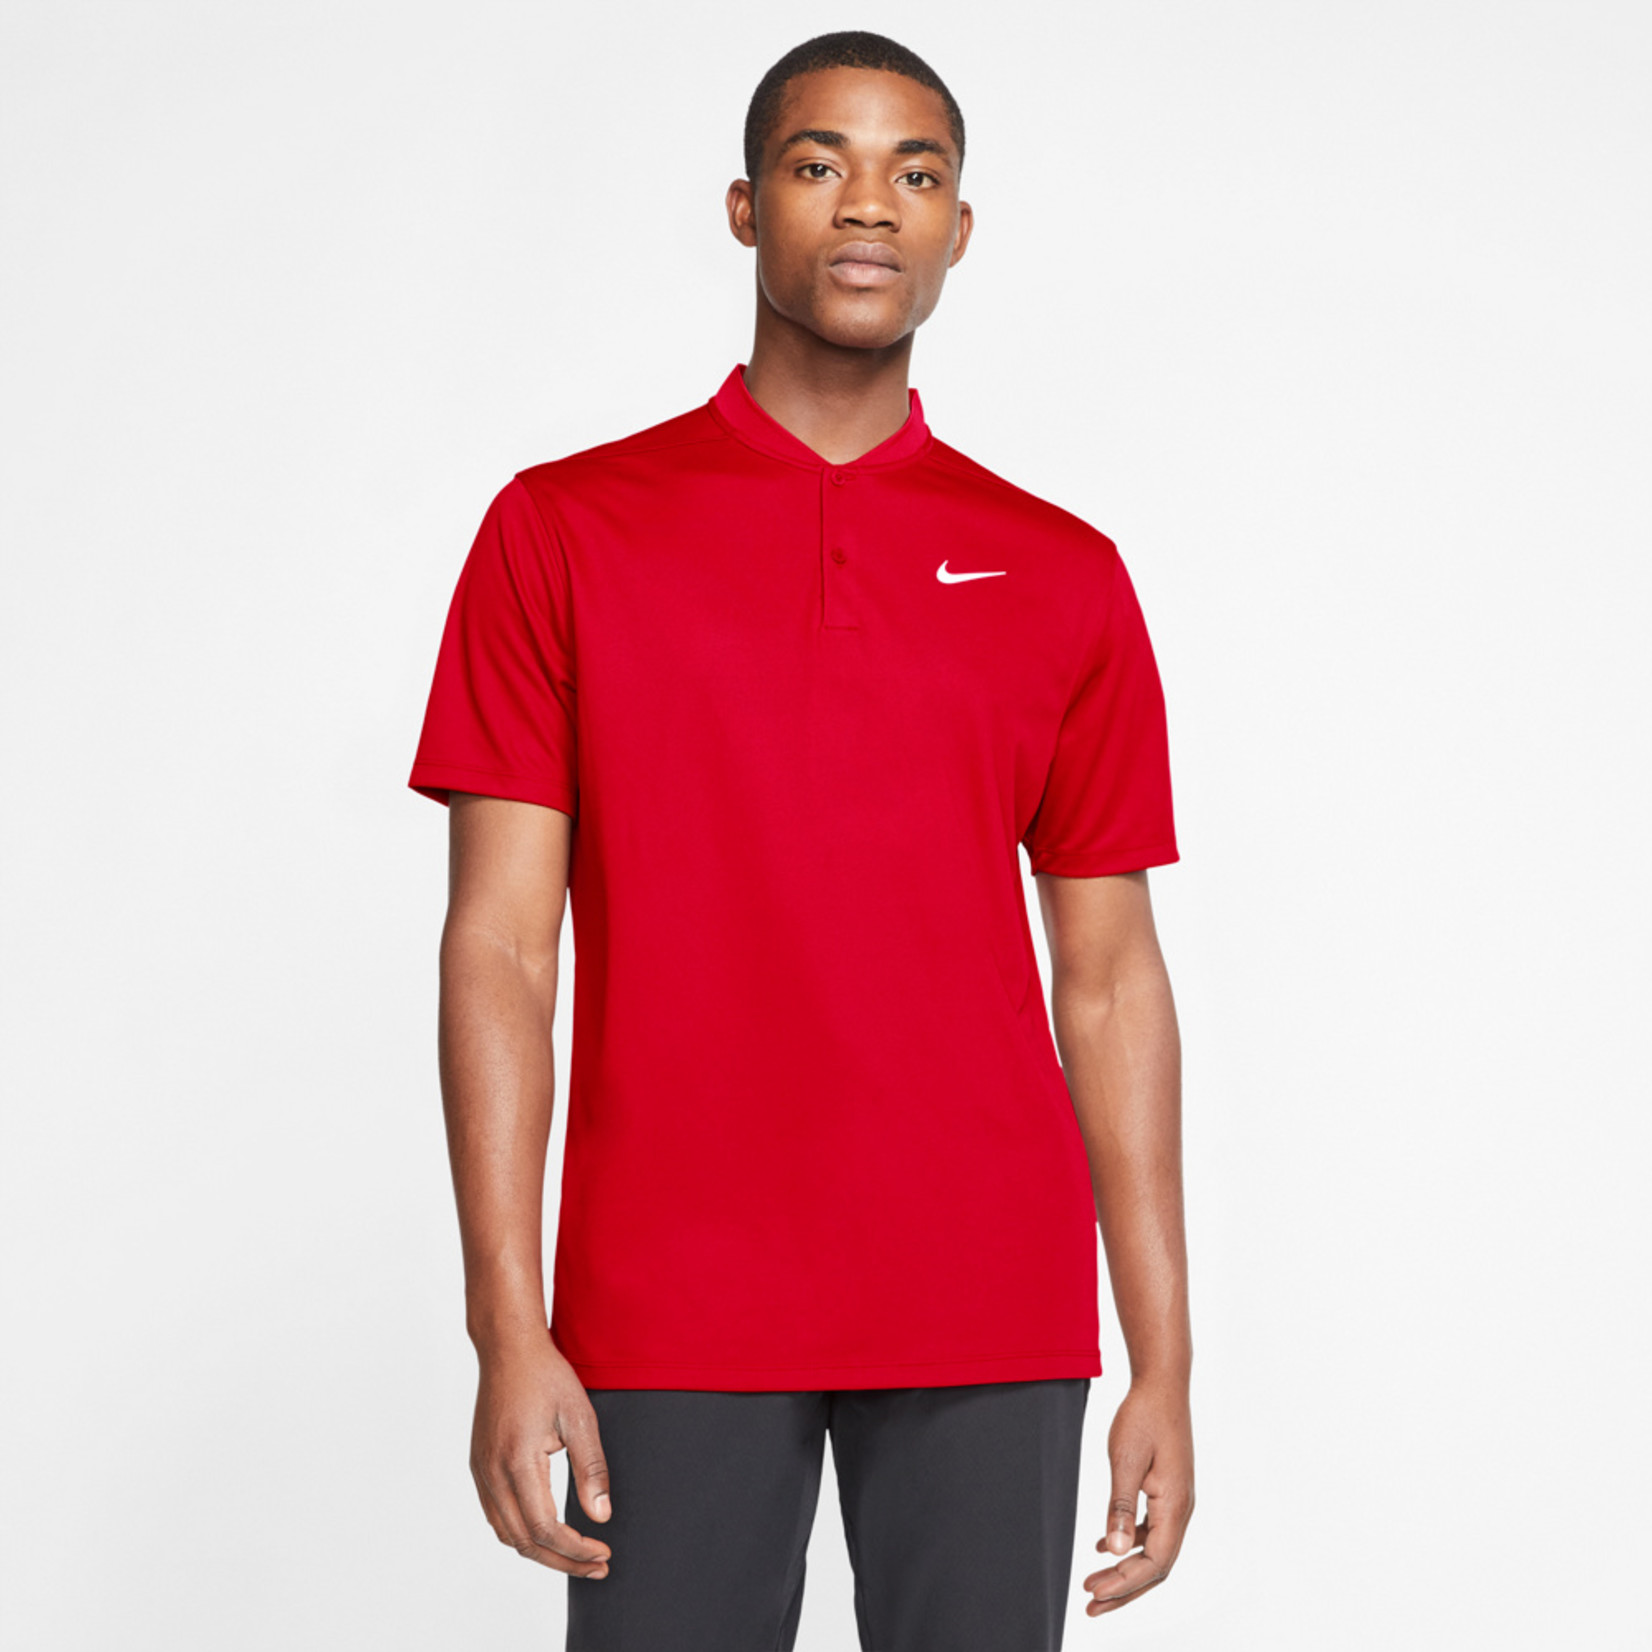 Nike Nike Dri-FIT Victory Men's Golf Polo (21)